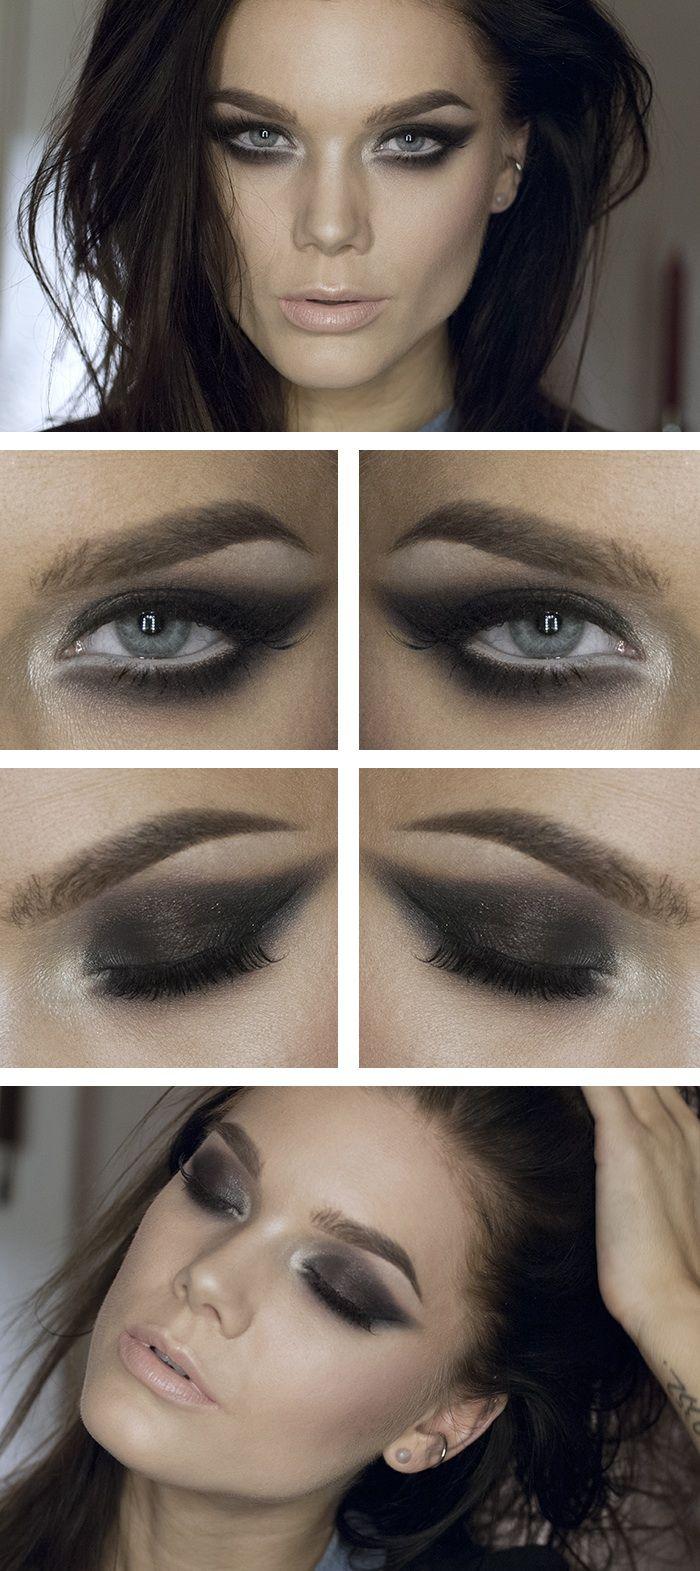 Sun.Dec.22/13, LINDA HALLBERG : TODAYS LOOK - A CHILD OF THE WILD JUST LIKE YOU.  I've used ... EYES: NYS HD Eyeshadow base, Anastasia Lavish palette, MUS Wonder powder Sinai, MUS Eyepencil Snowflake, MUS Cake eyeliner black, MUS Lash art Miss, NYX Doll eyes mascara Waterproof.  LIPS: MAC Lipstick Creme d'nude.  CHEEKS: Anastasia Contour kit, NARS cheekpalette soulshine, MUS Wonder powder Sinai